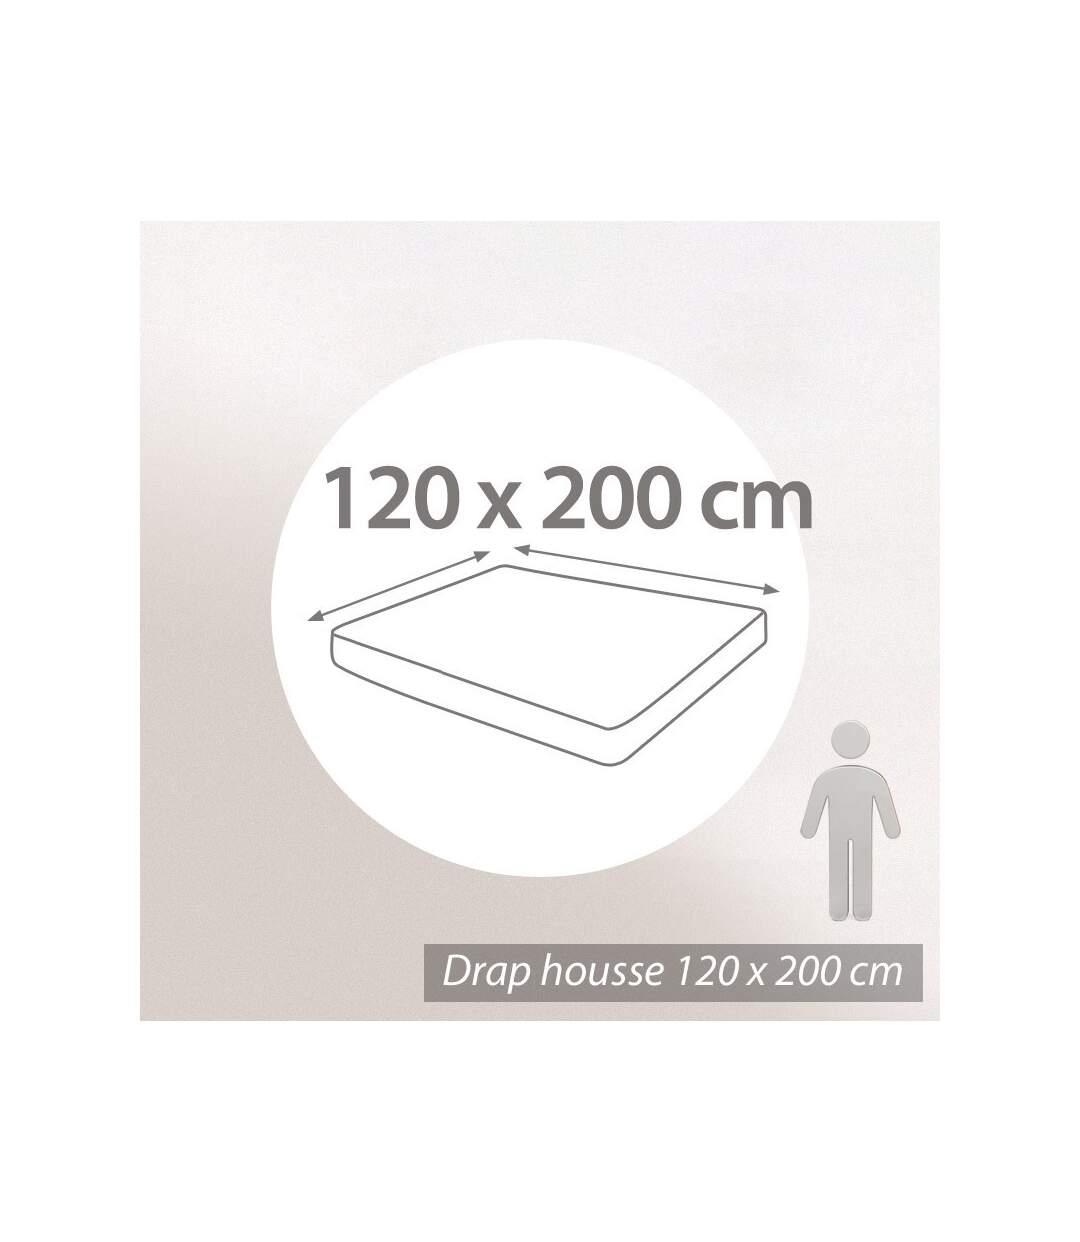 Protège matelas 120x200 absorbant Antonin